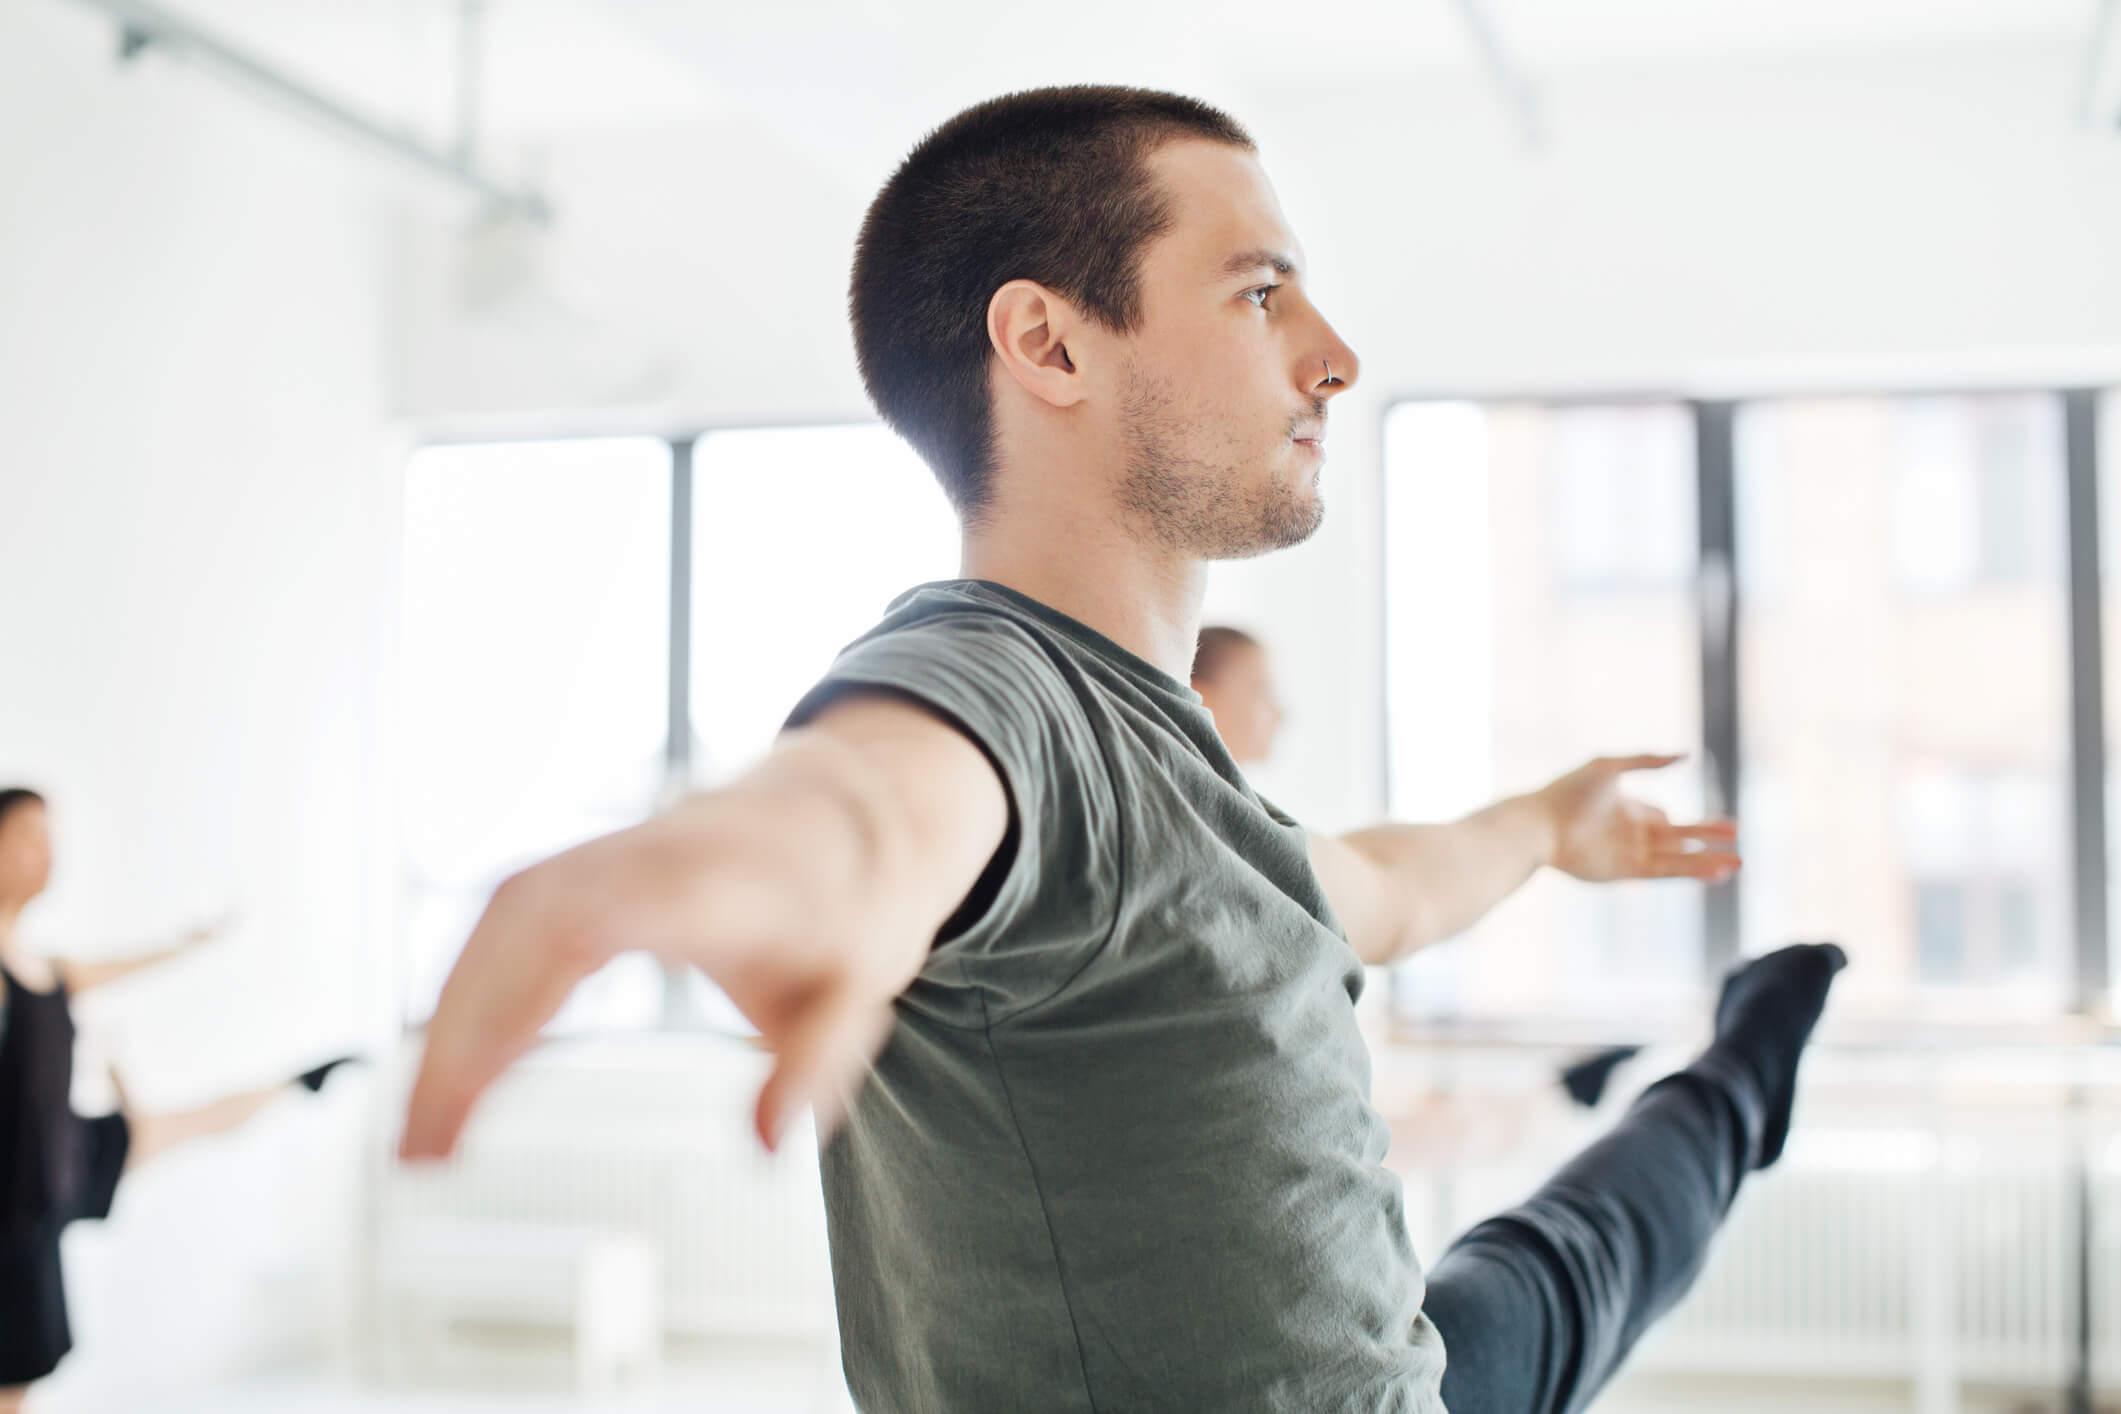 rotina bailarino profissional